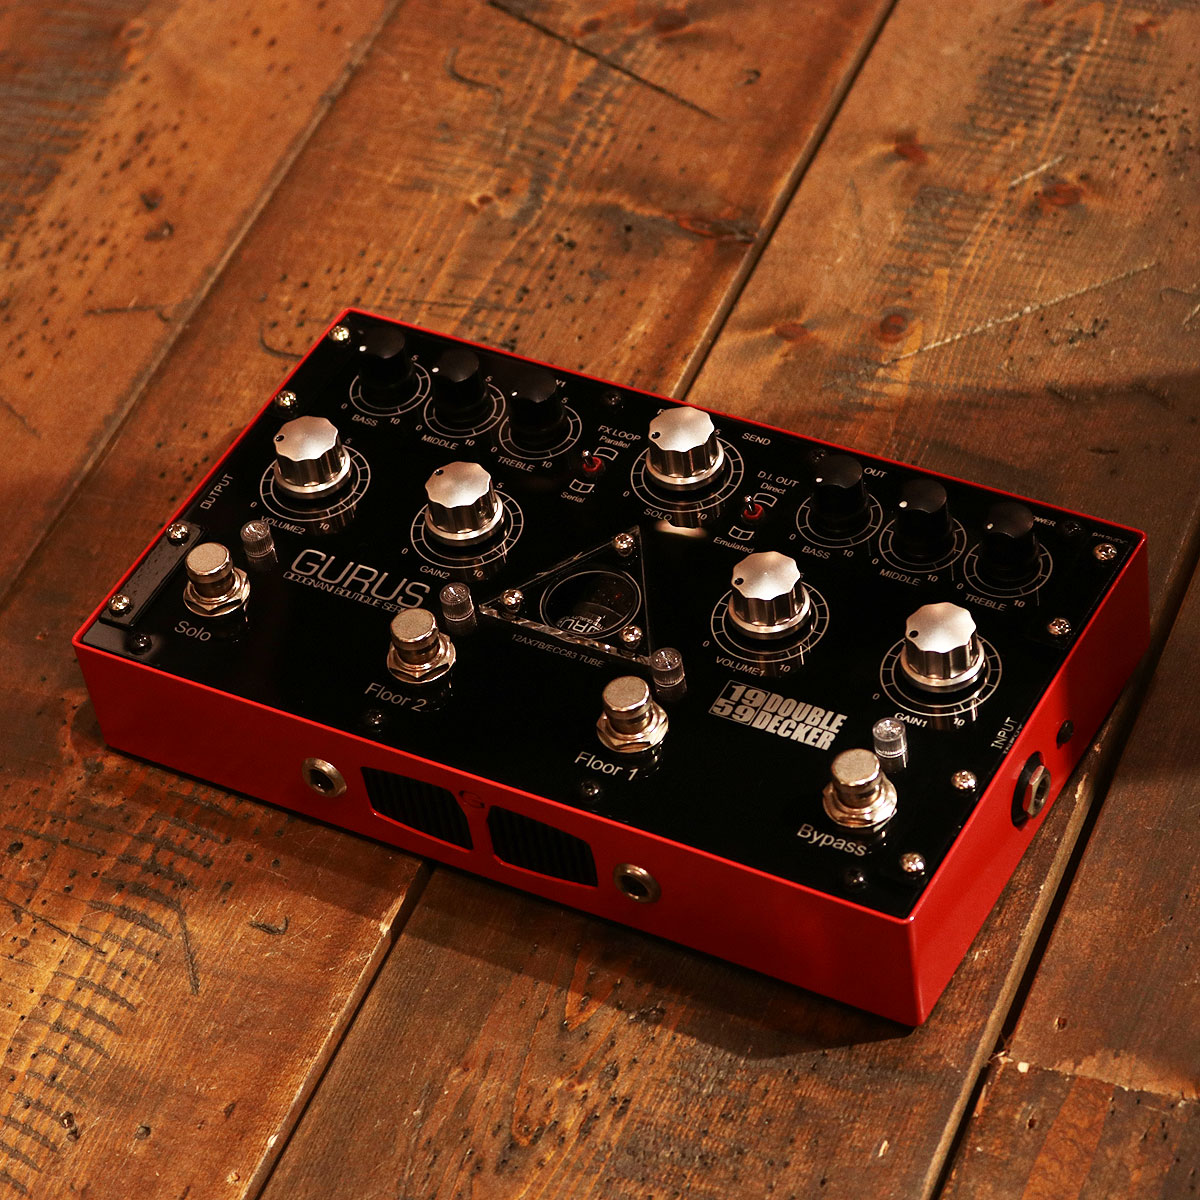 Gurus Amp / 1959 Double Decker 【2チャンネル・プリアンプ・オーバードライブペダル】【渋谷店】